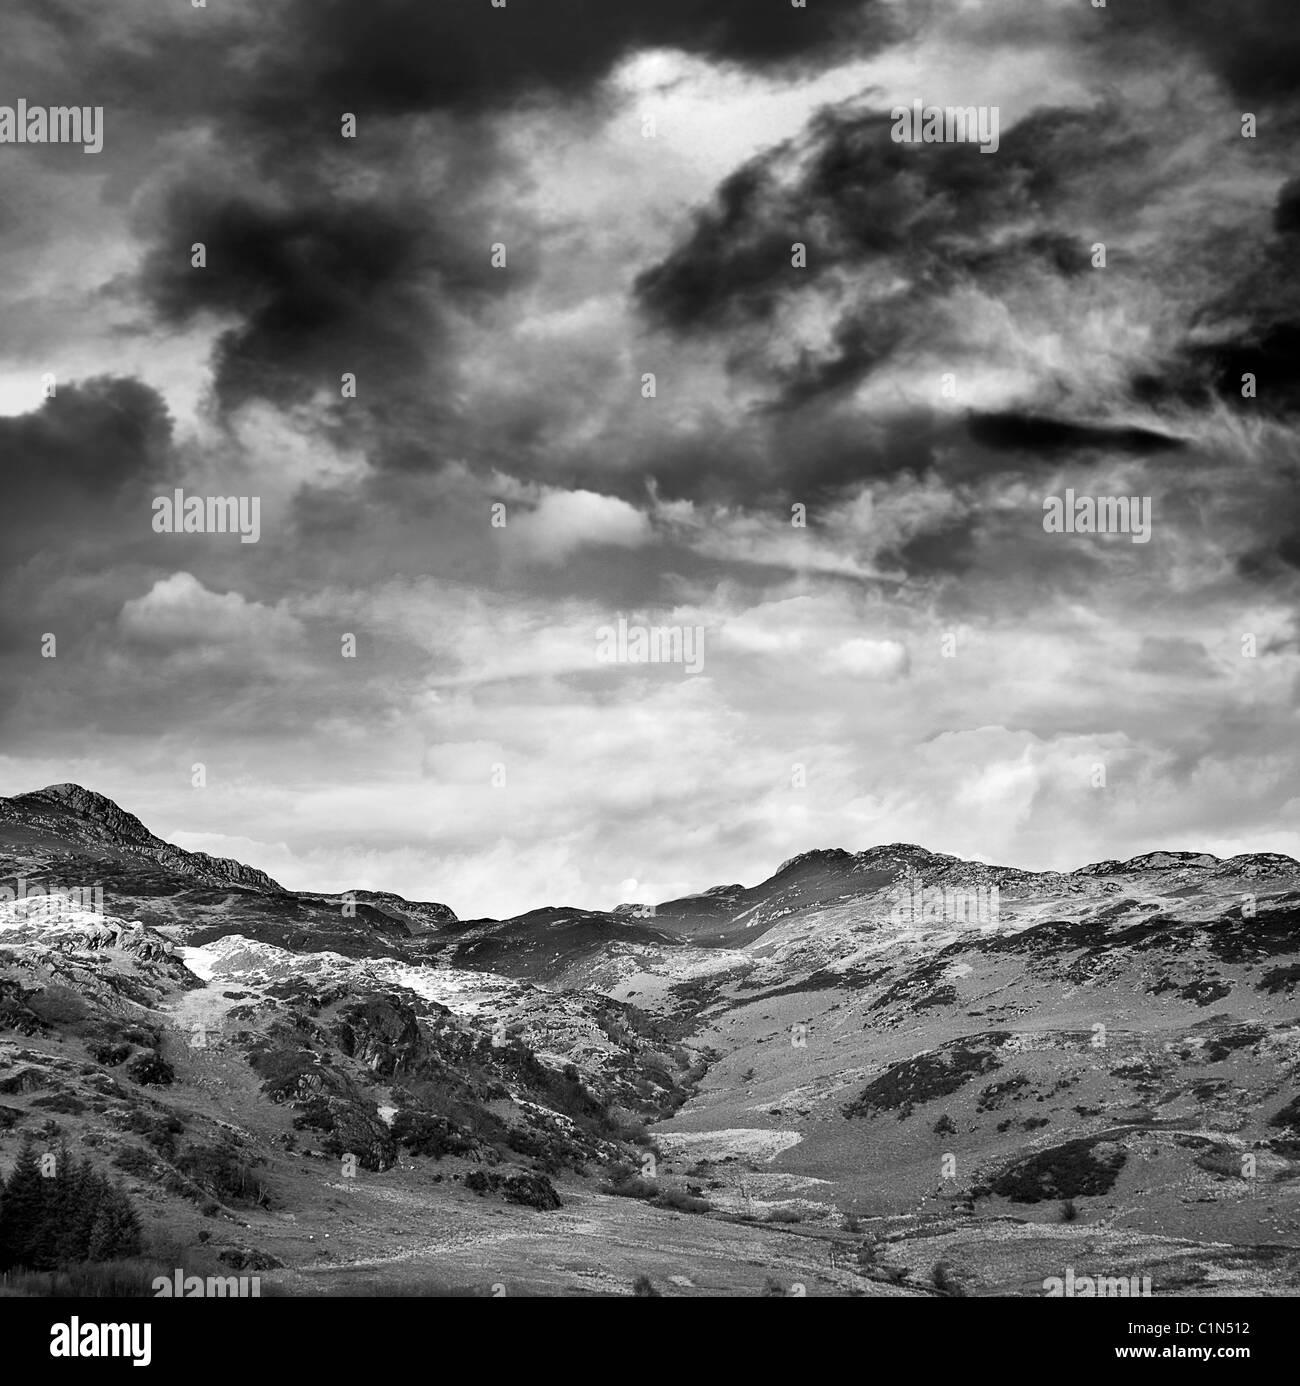 Hilly landscape - Stock Image